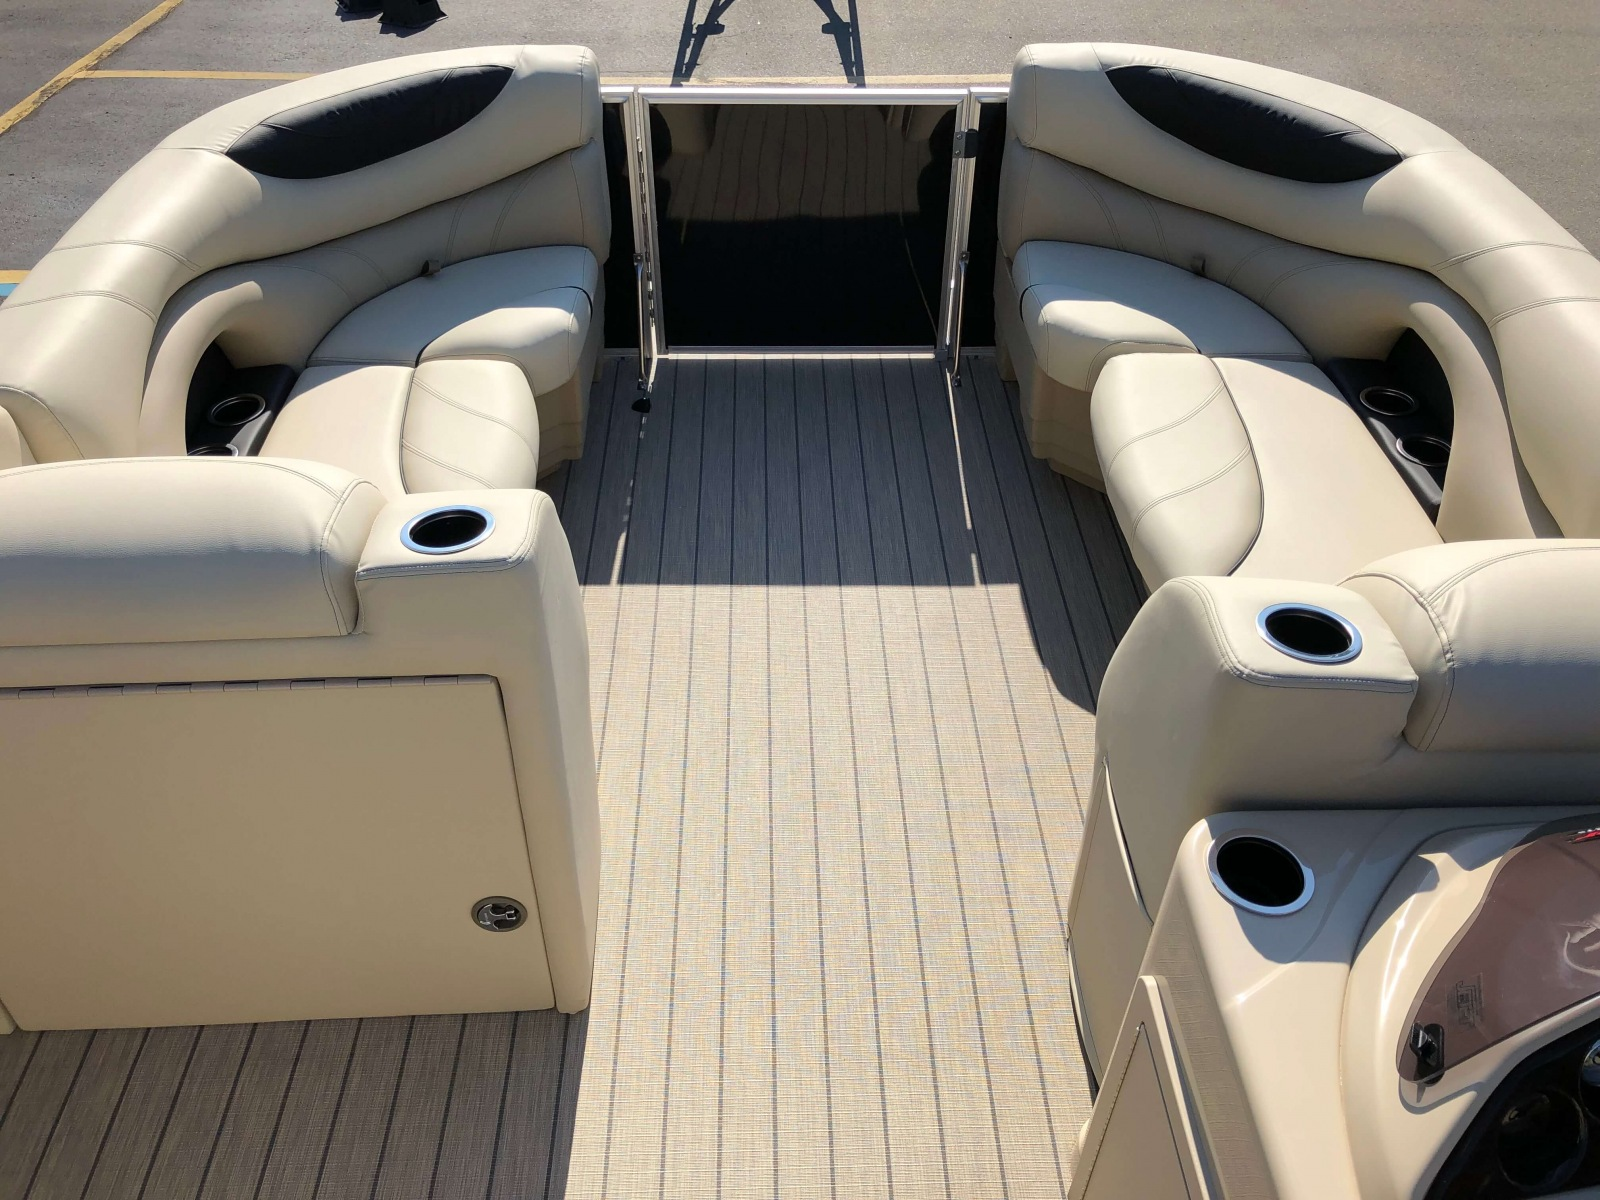 2019-Sylvan-8522-CLZ-Pontoon-Boat-Layout-4